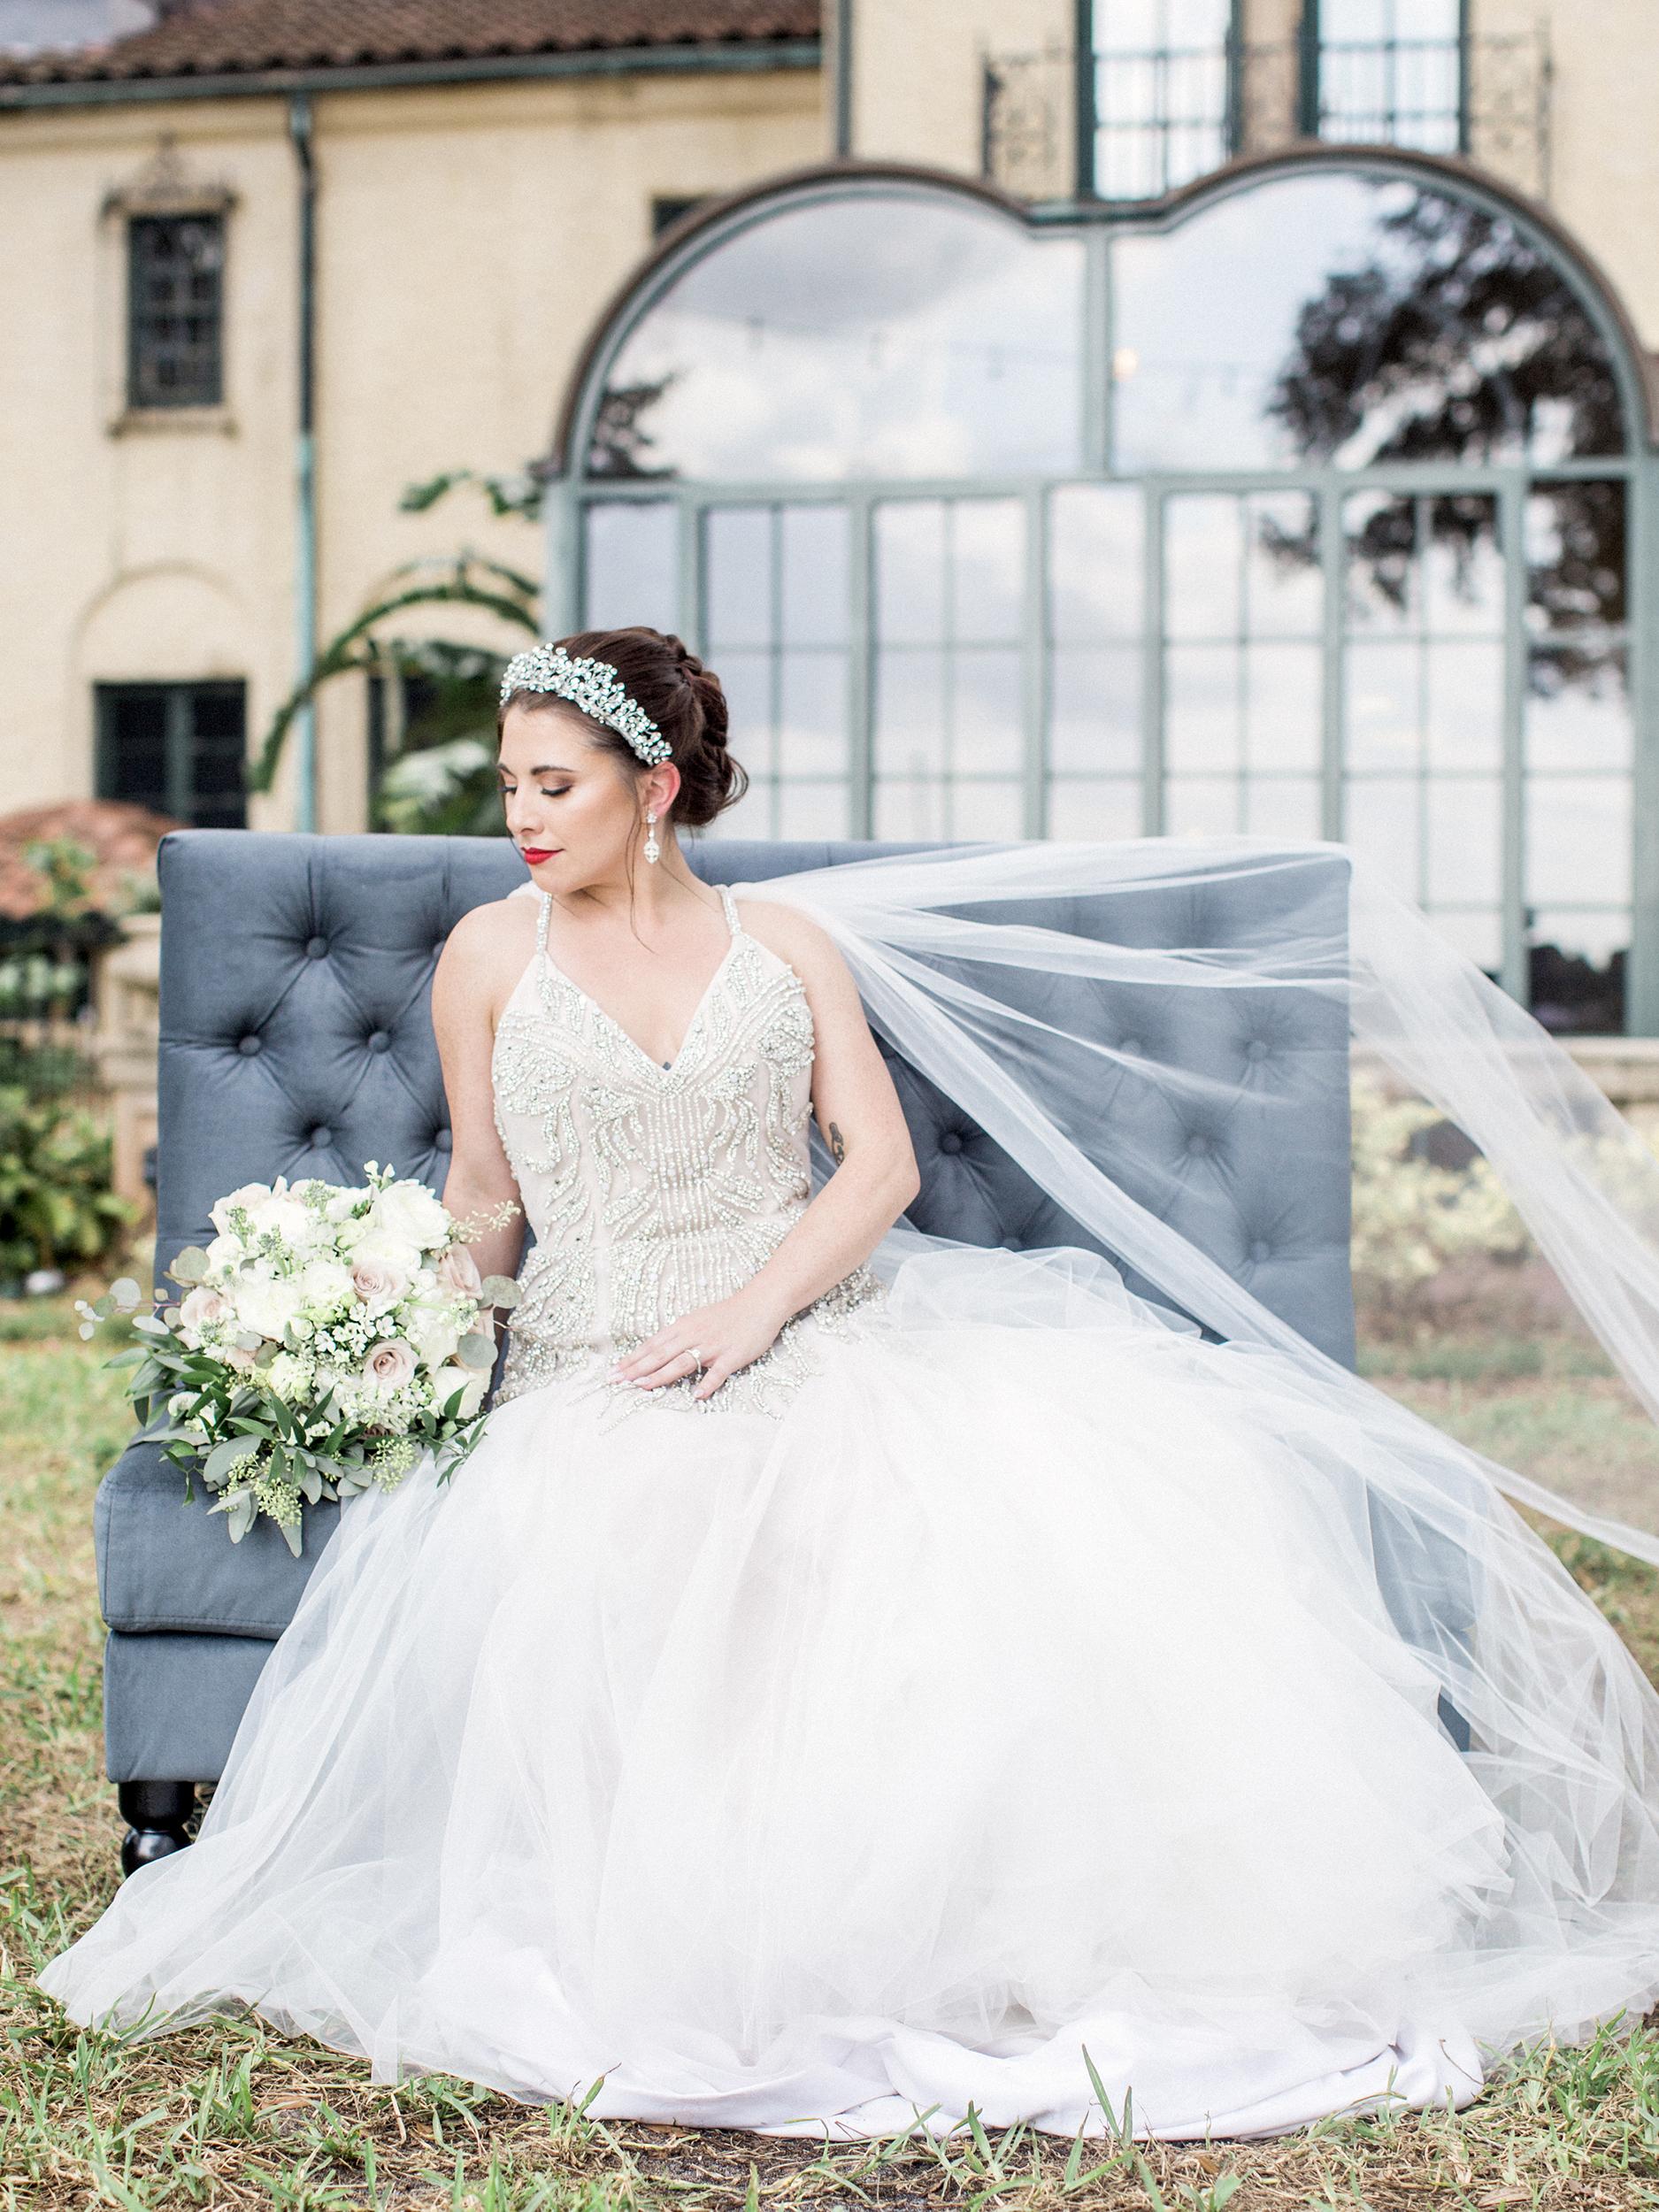 Lisa Silva Photography- Jacksonville, Florida Fine Art Film Wedding Photography Epping Forrest Yacht Club 16.jpg